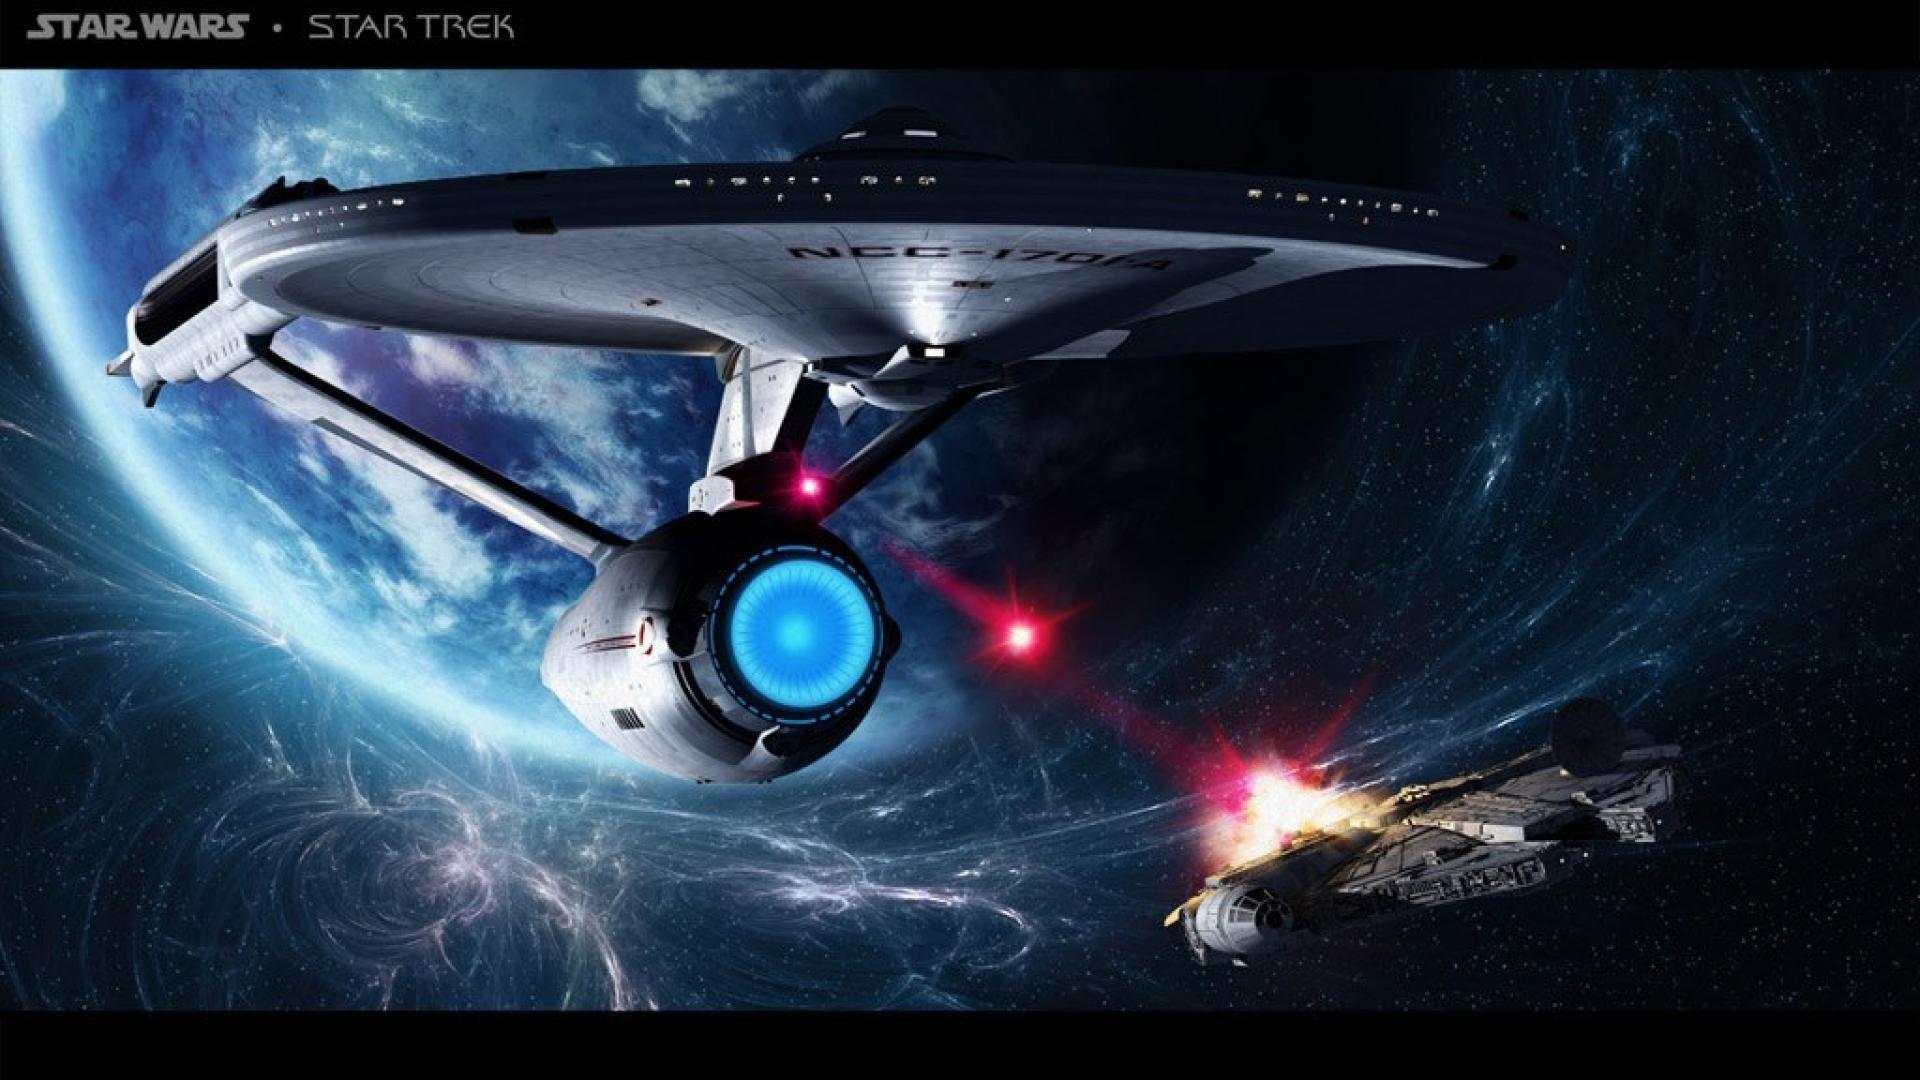 Star Trek Enterprise Wallpaper Hd 70 Images